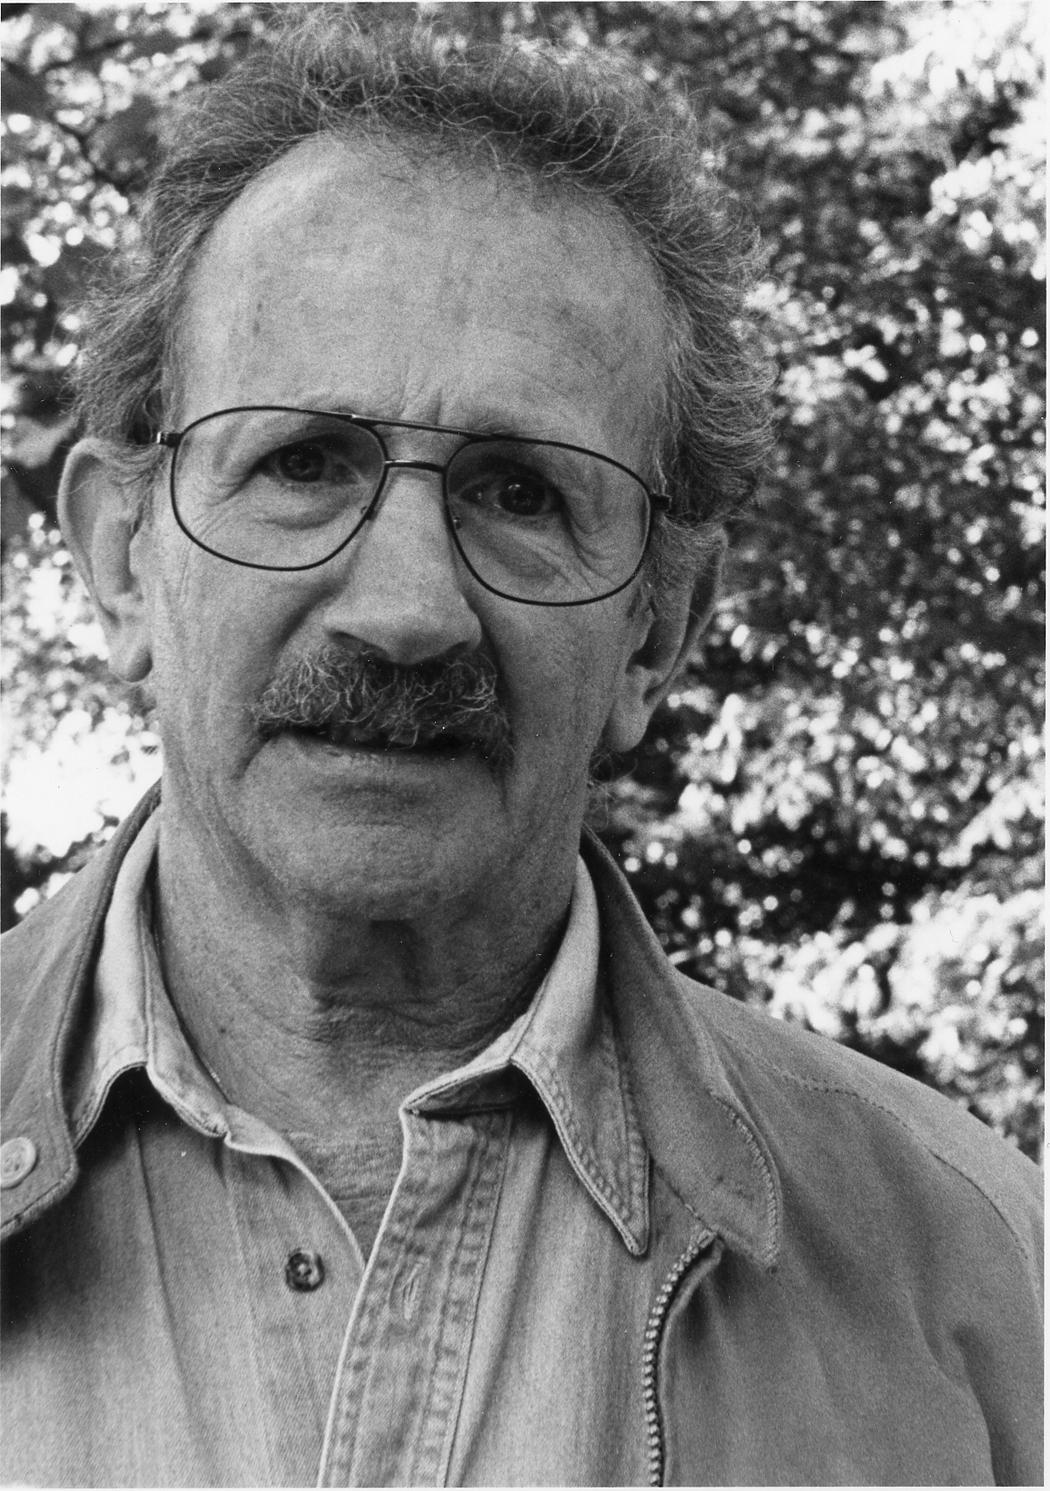 Laureate Philip Levine, Working Class Poet | Better Living through ...